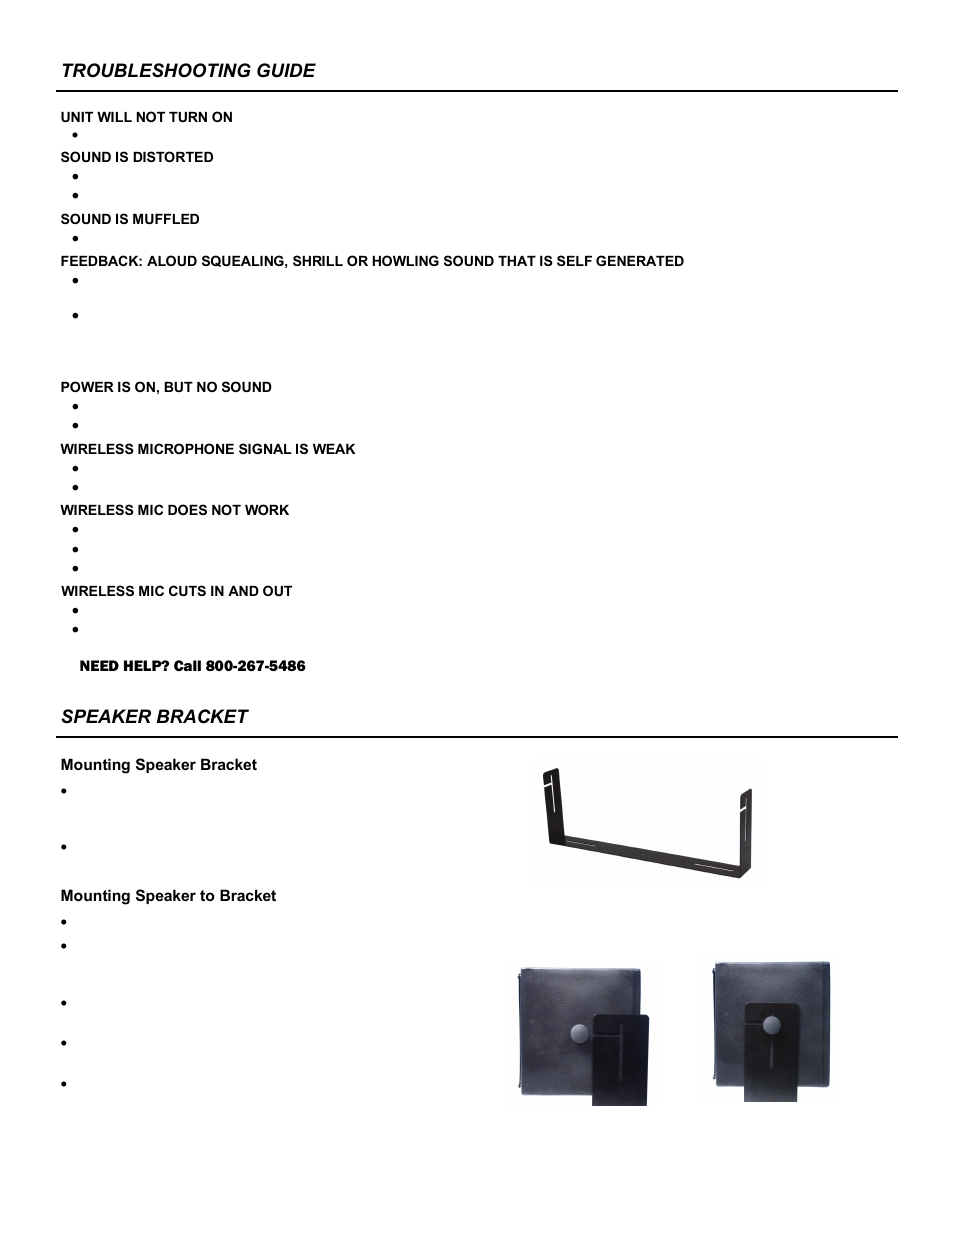 ... Array - speaker bracket troubleshooting guide amplivox sw1230 user  manual rh manualsdir com